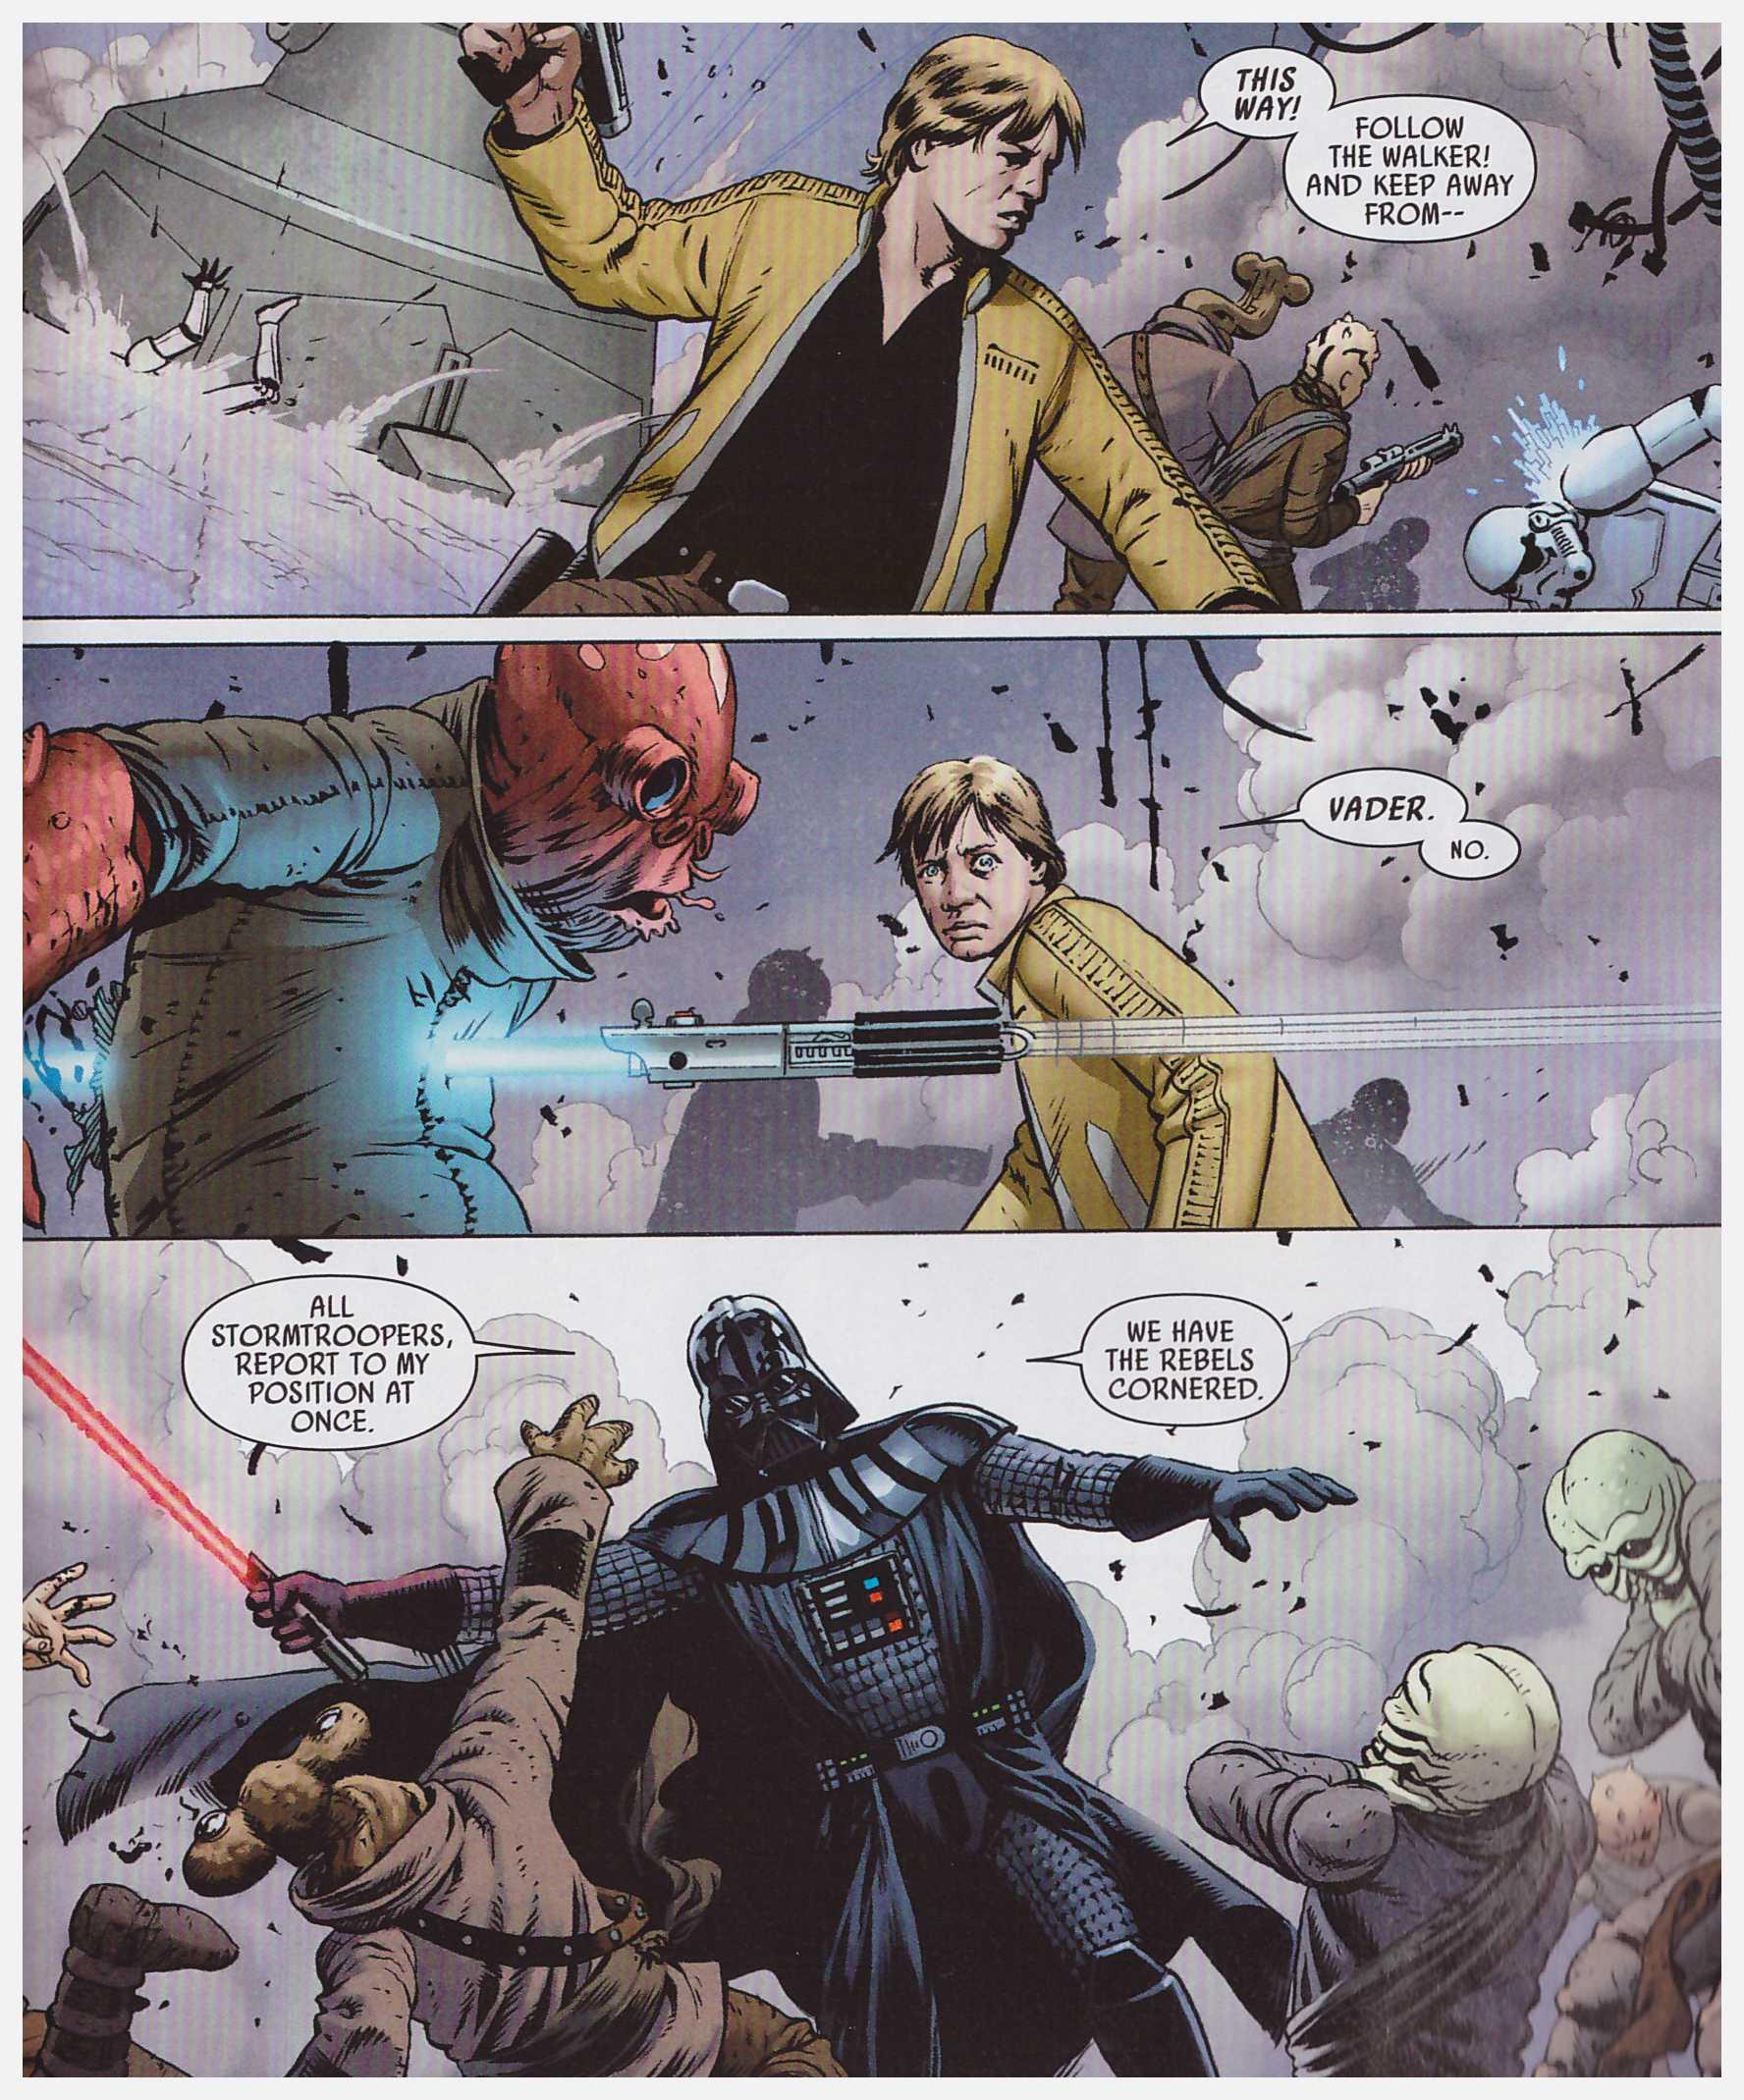 Star Wars Skywalker Strikes review